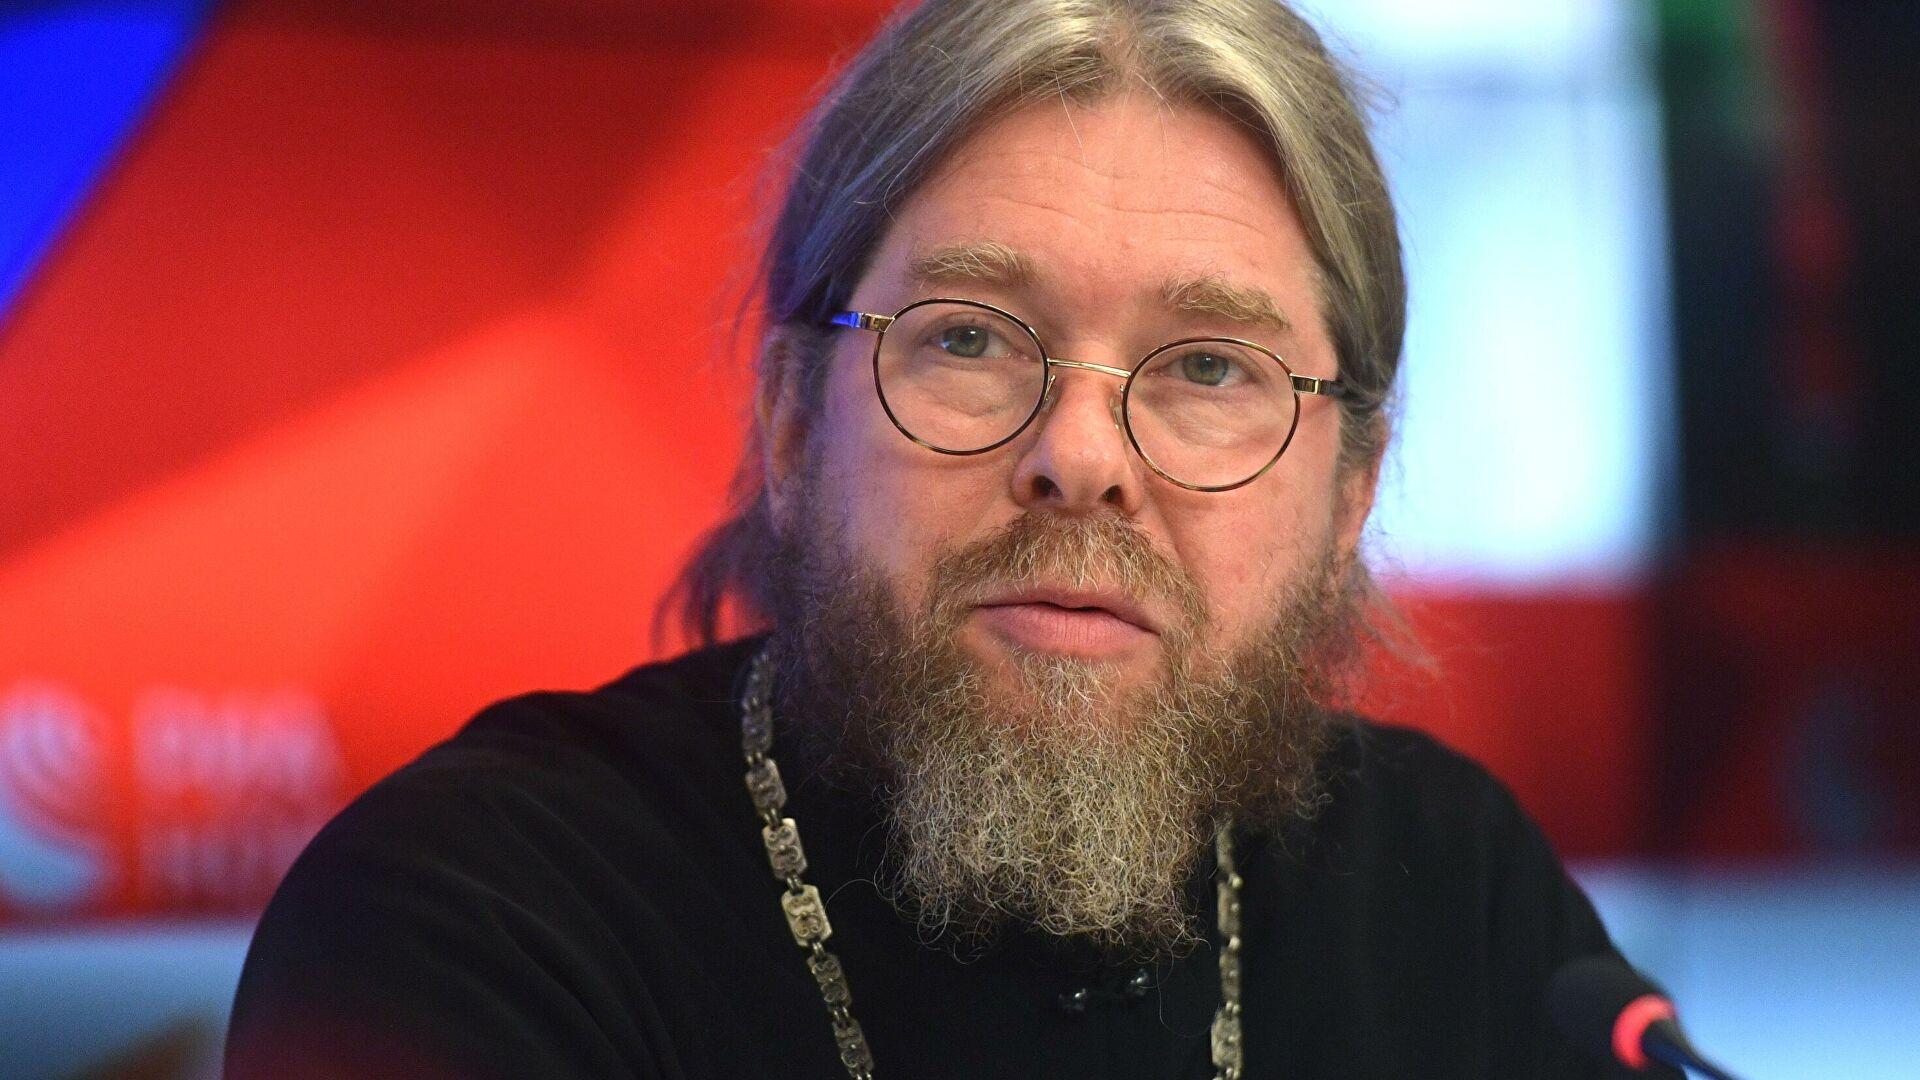 Митрополит Тихон озвучил позицию РПЦ по новейшим биотехнологиям